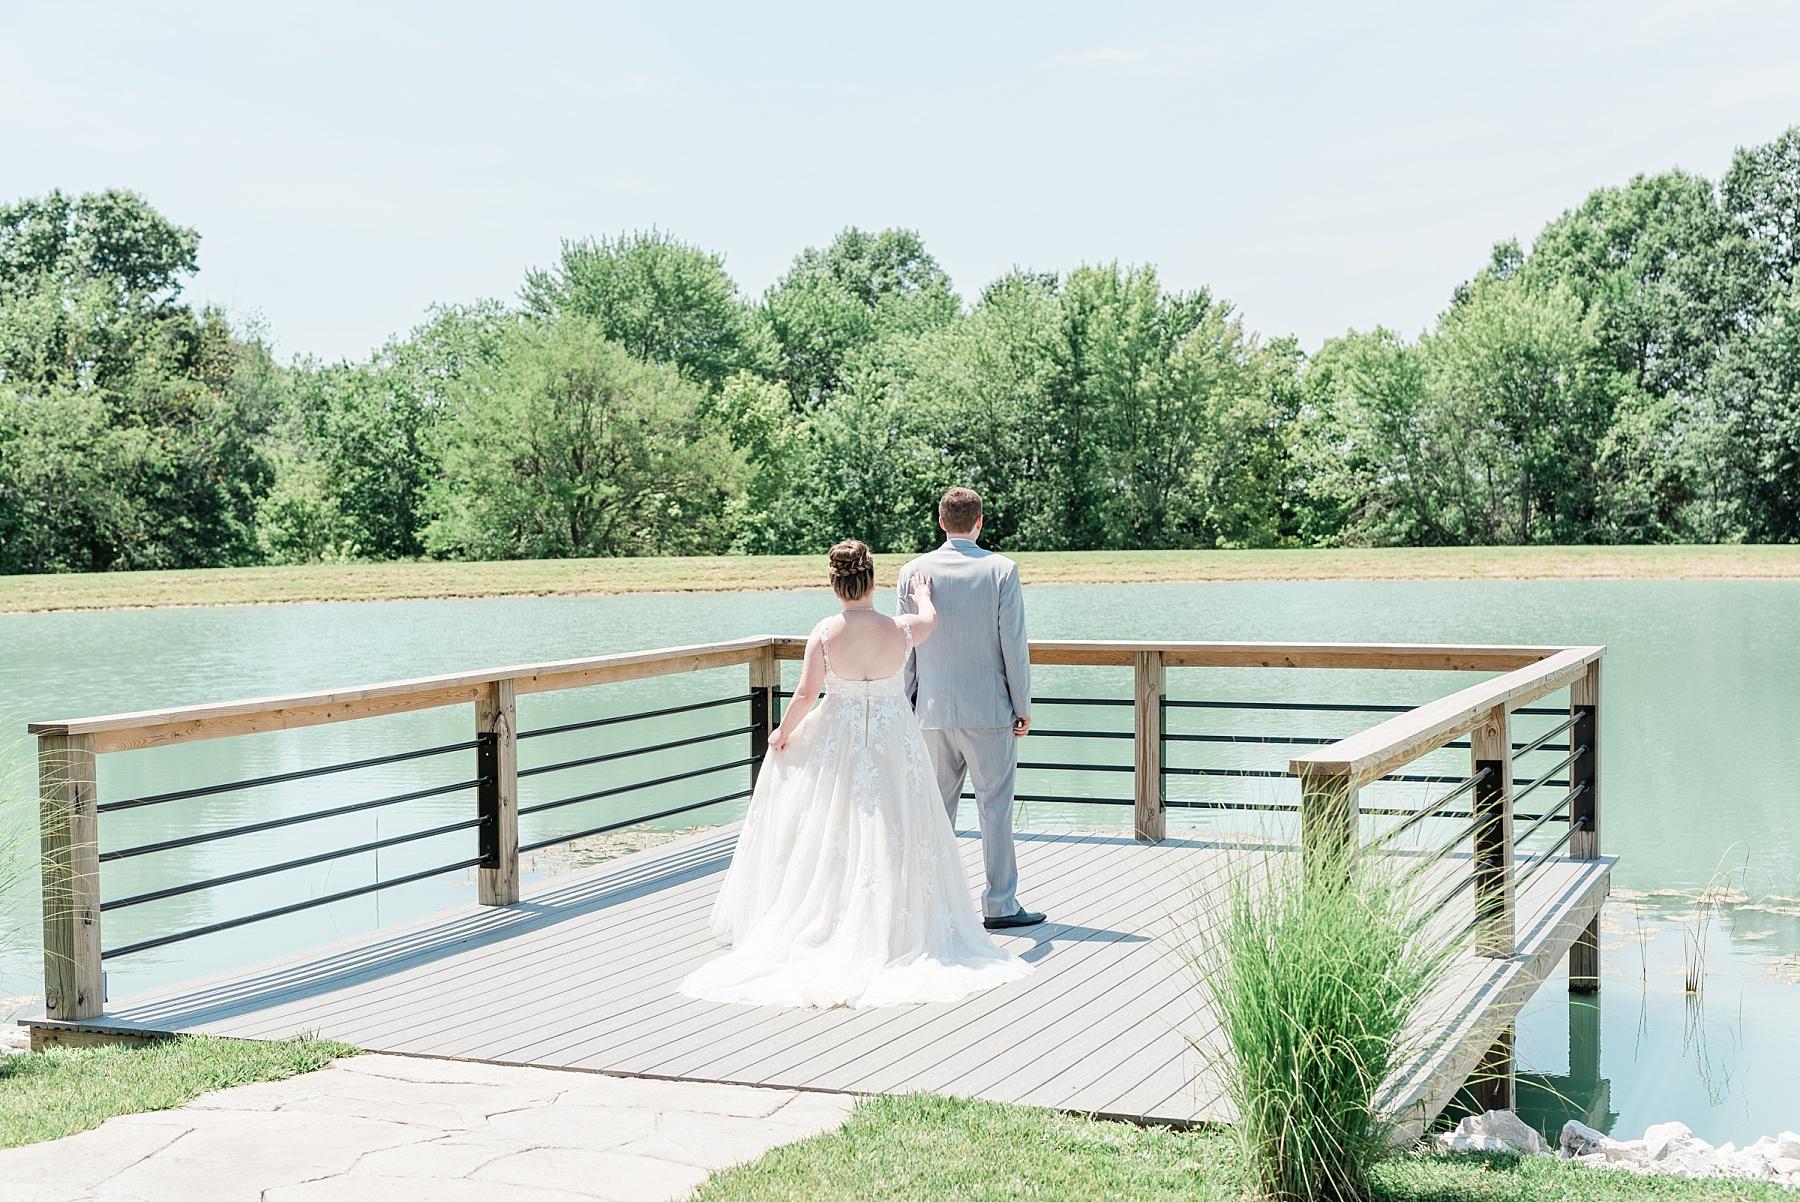 Intimate Summer Wedding at Emerson Fields by Kelsi Kliethermes Photography Best Missouri and Maui Wedding Photographer_0025.jpg